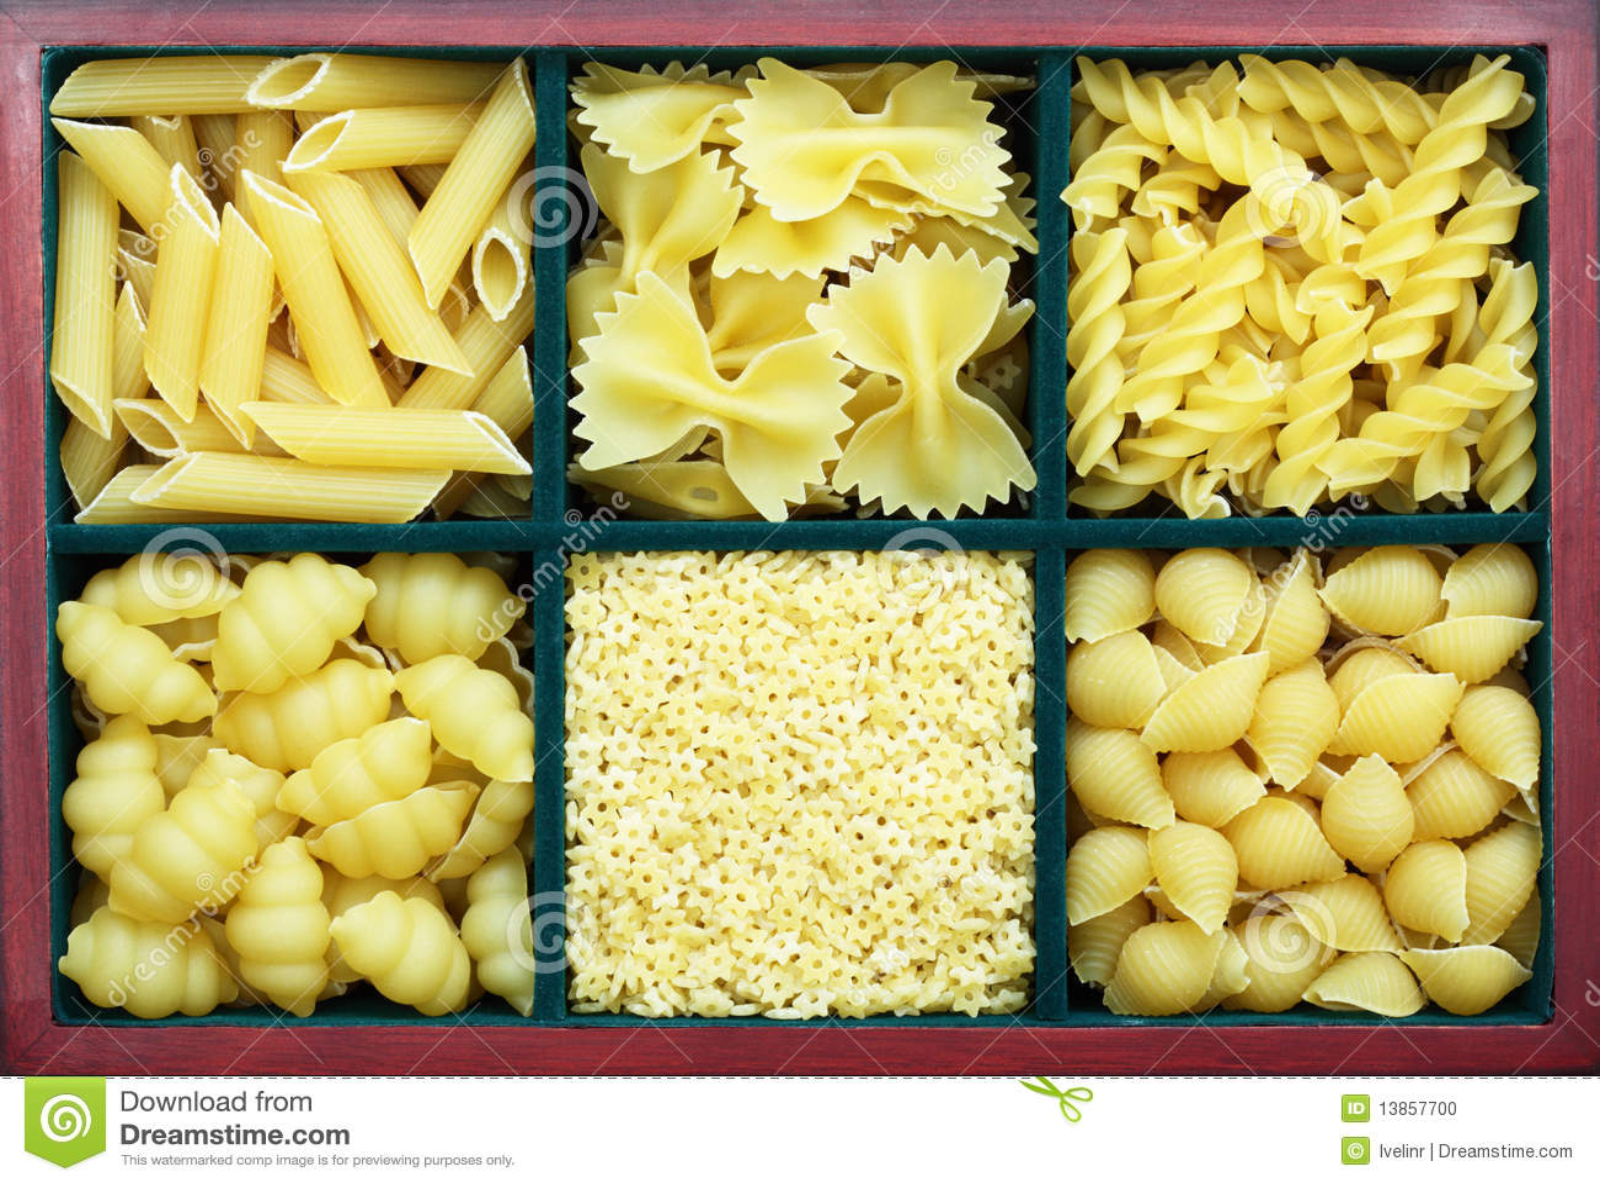 Many types of pasta